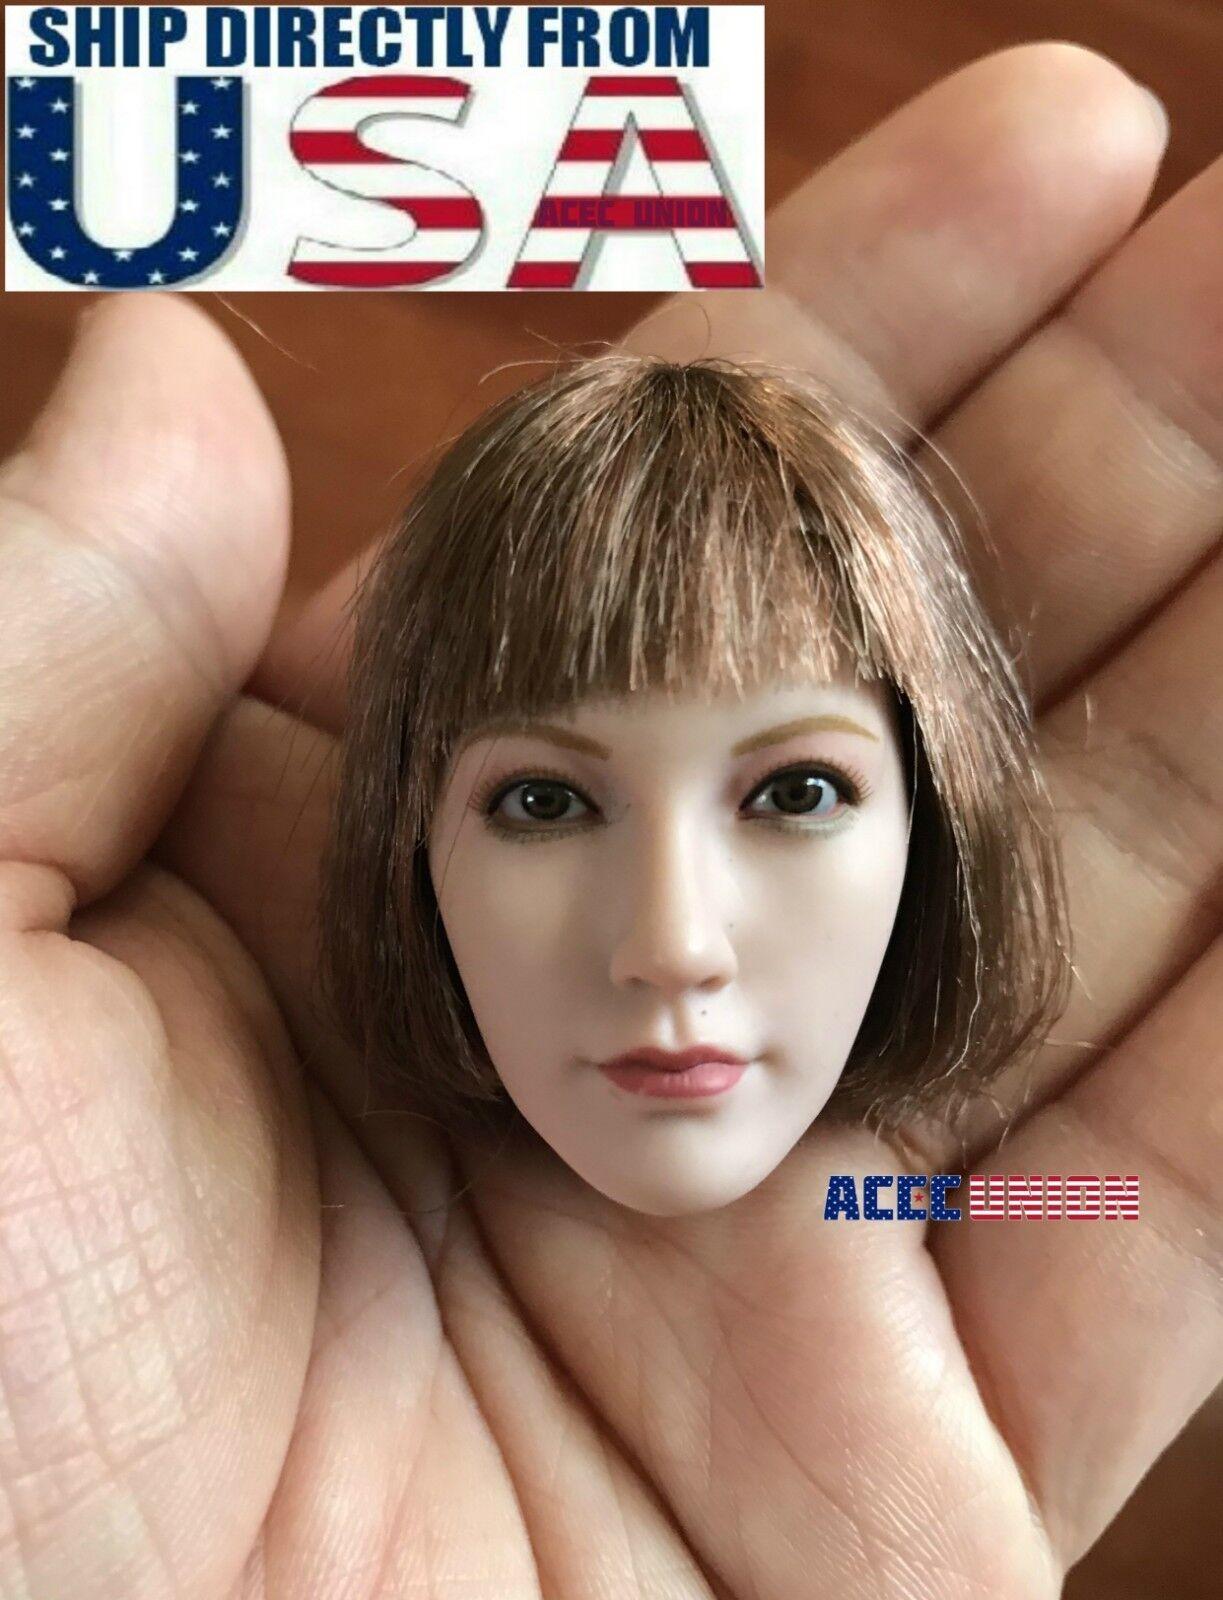 1 6 Female Head Sculpt SHORT HAIR For 12  PHICEN Pale Hot Toys Figure U.S.A.